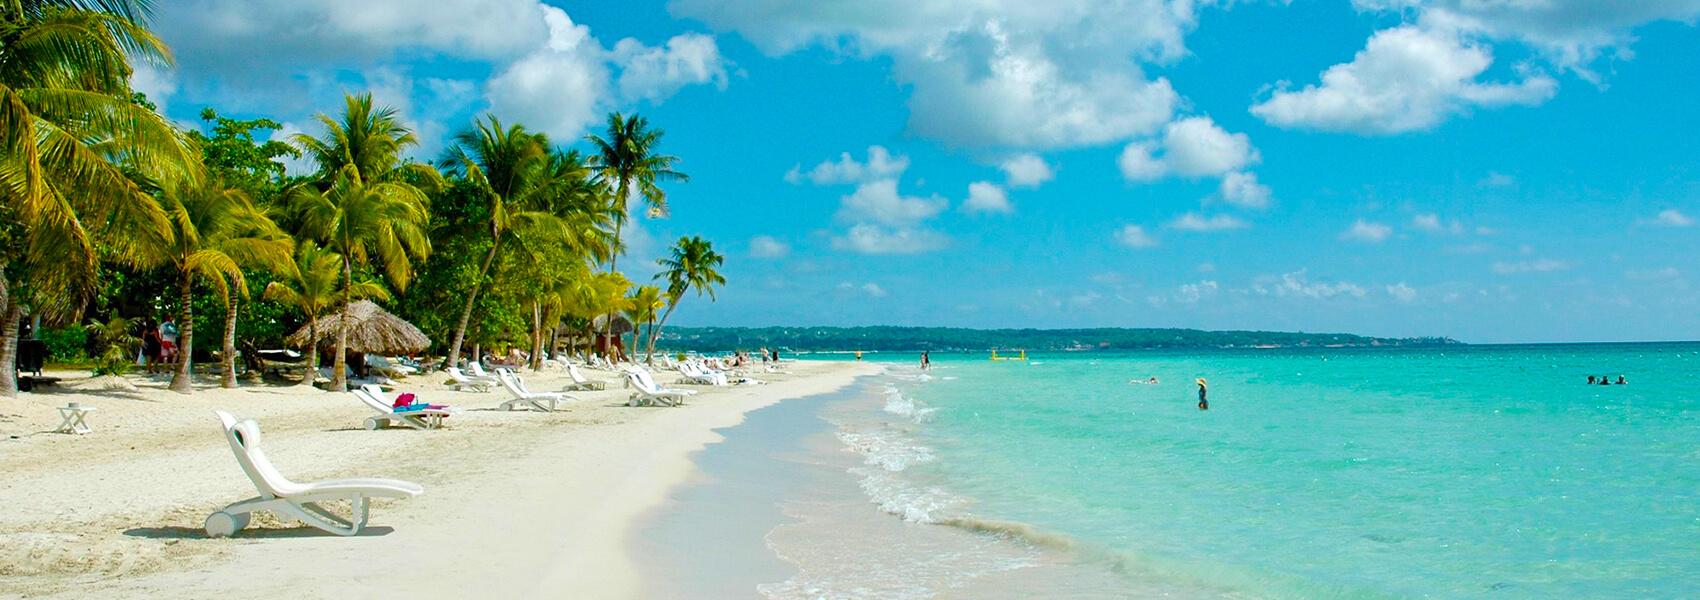 ocho rios bbw personals D e s t i n a t i o n s 5-day western caribbean cruise to ocho rios, jamaica and grand cayman, caymen islands.